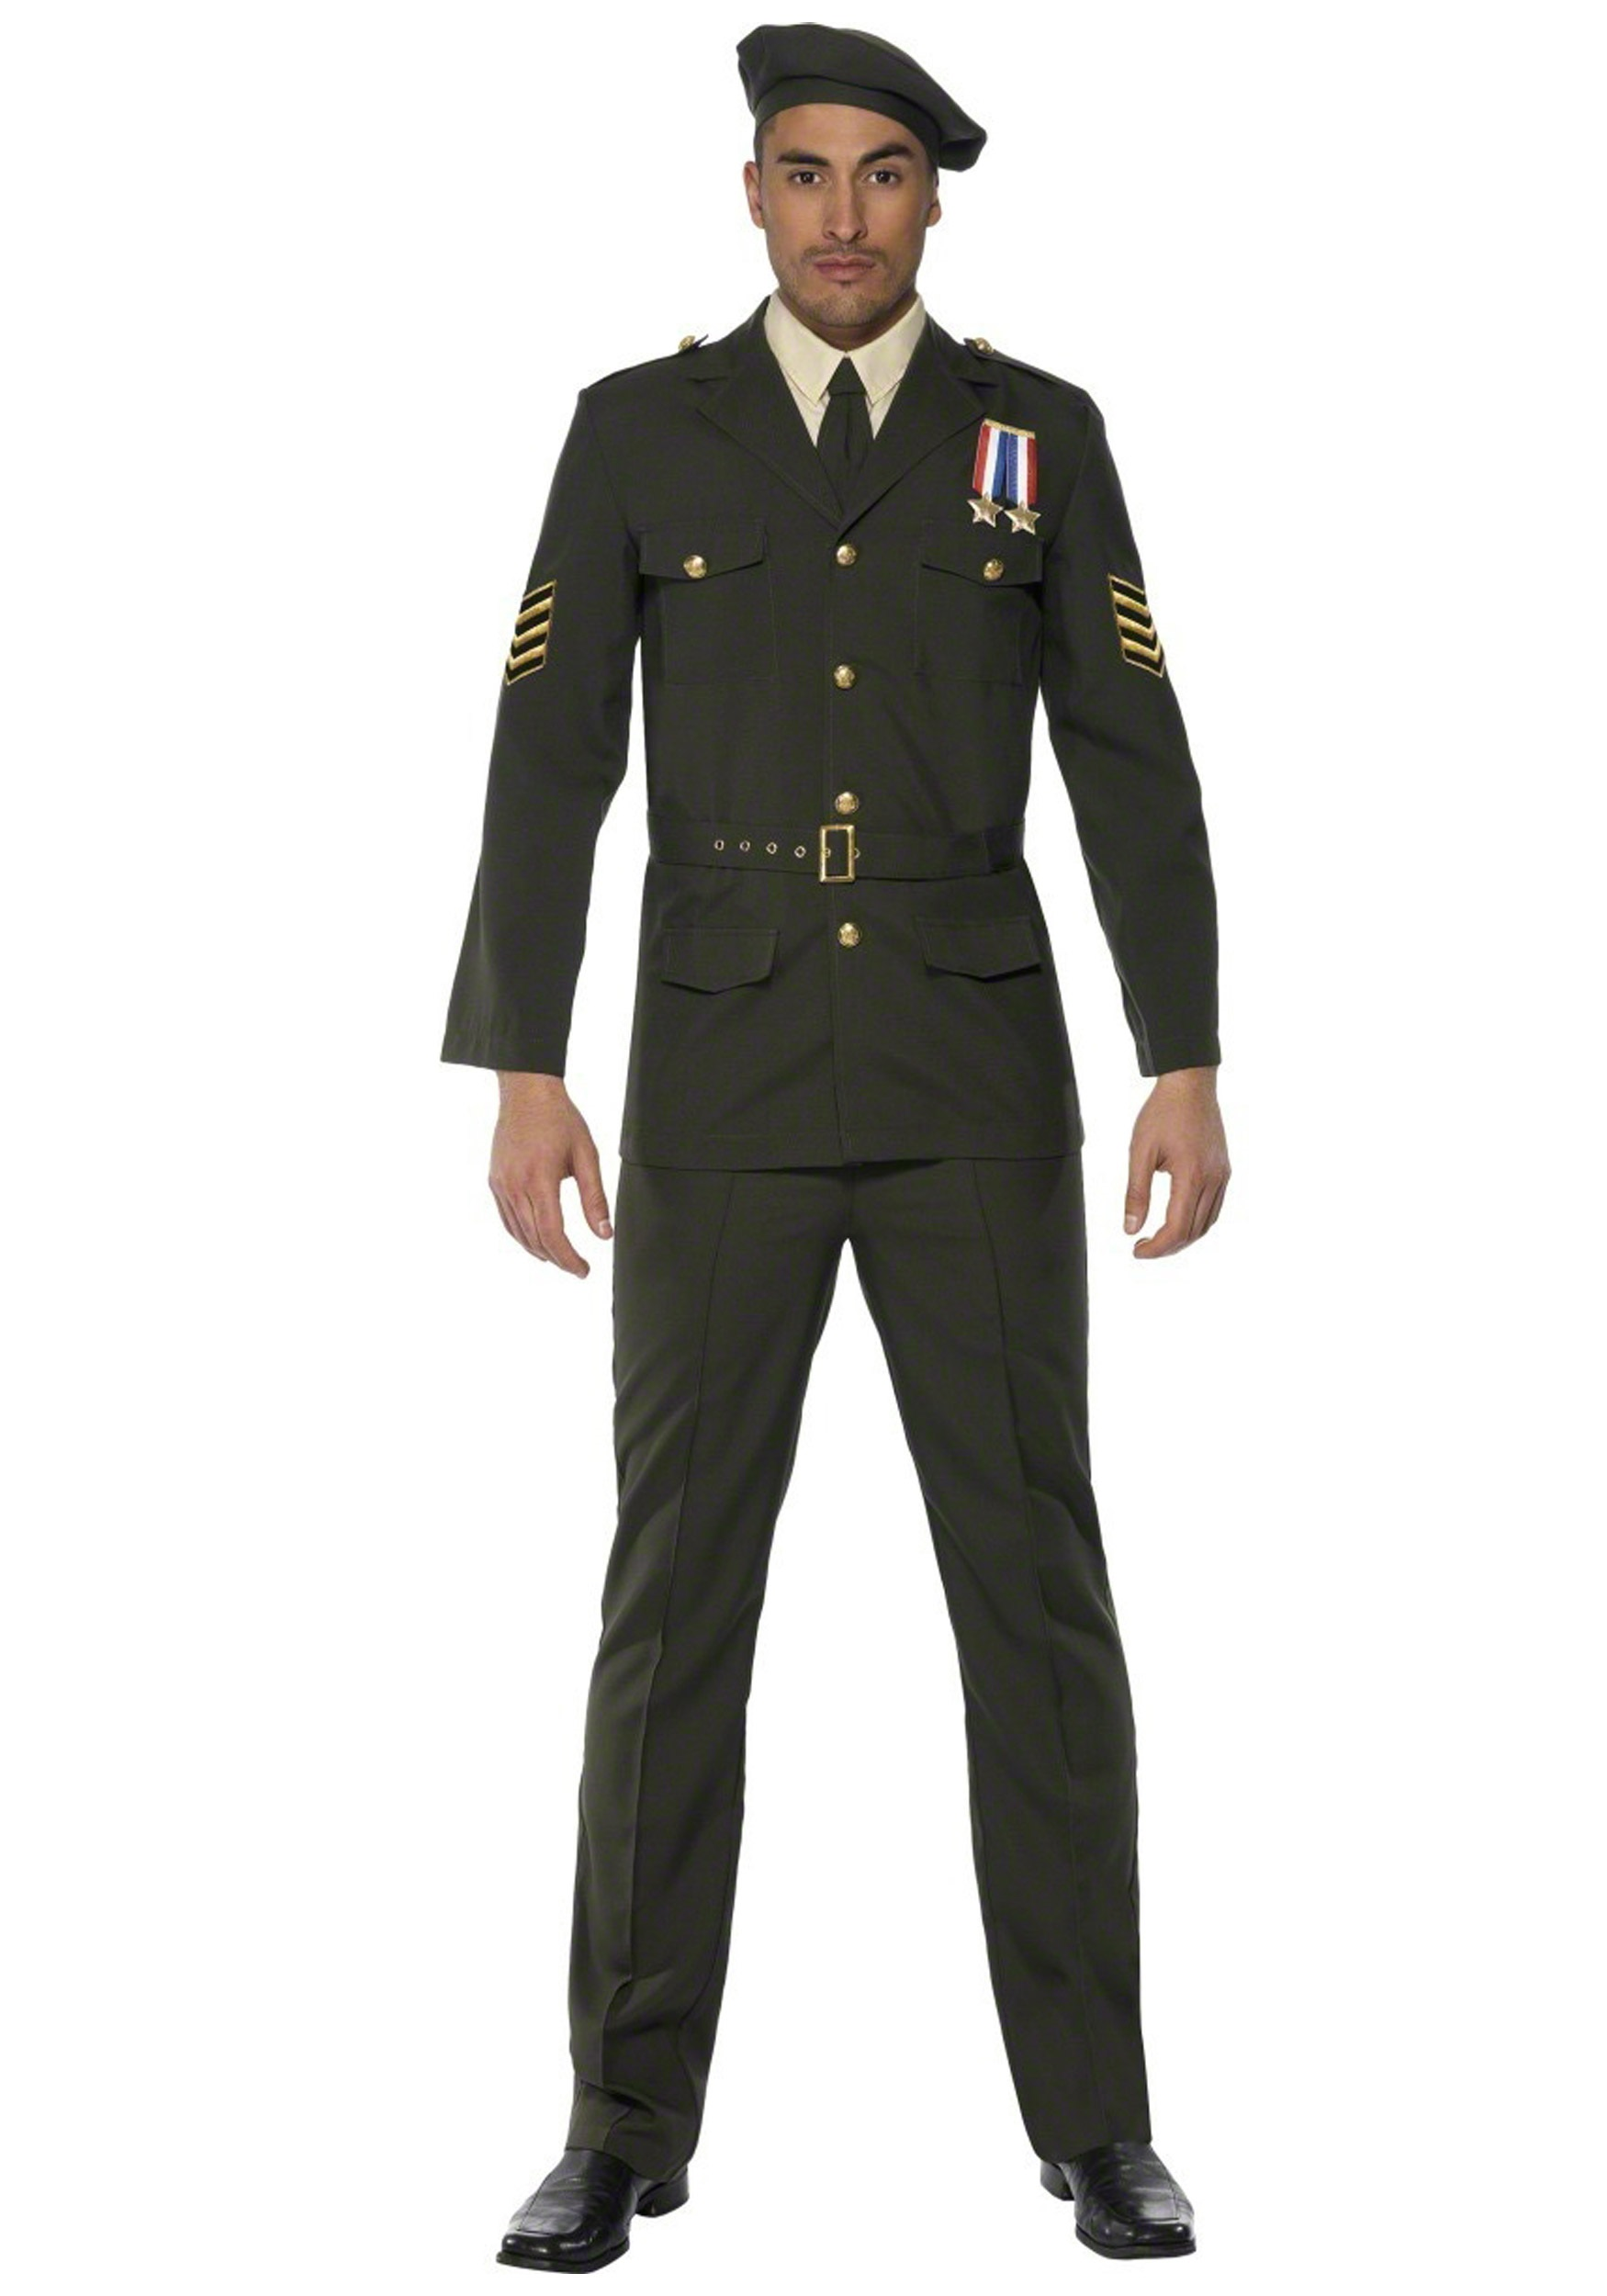 sc 1 st  Halloween Costumes UK & Mens Wartime Officer Costume